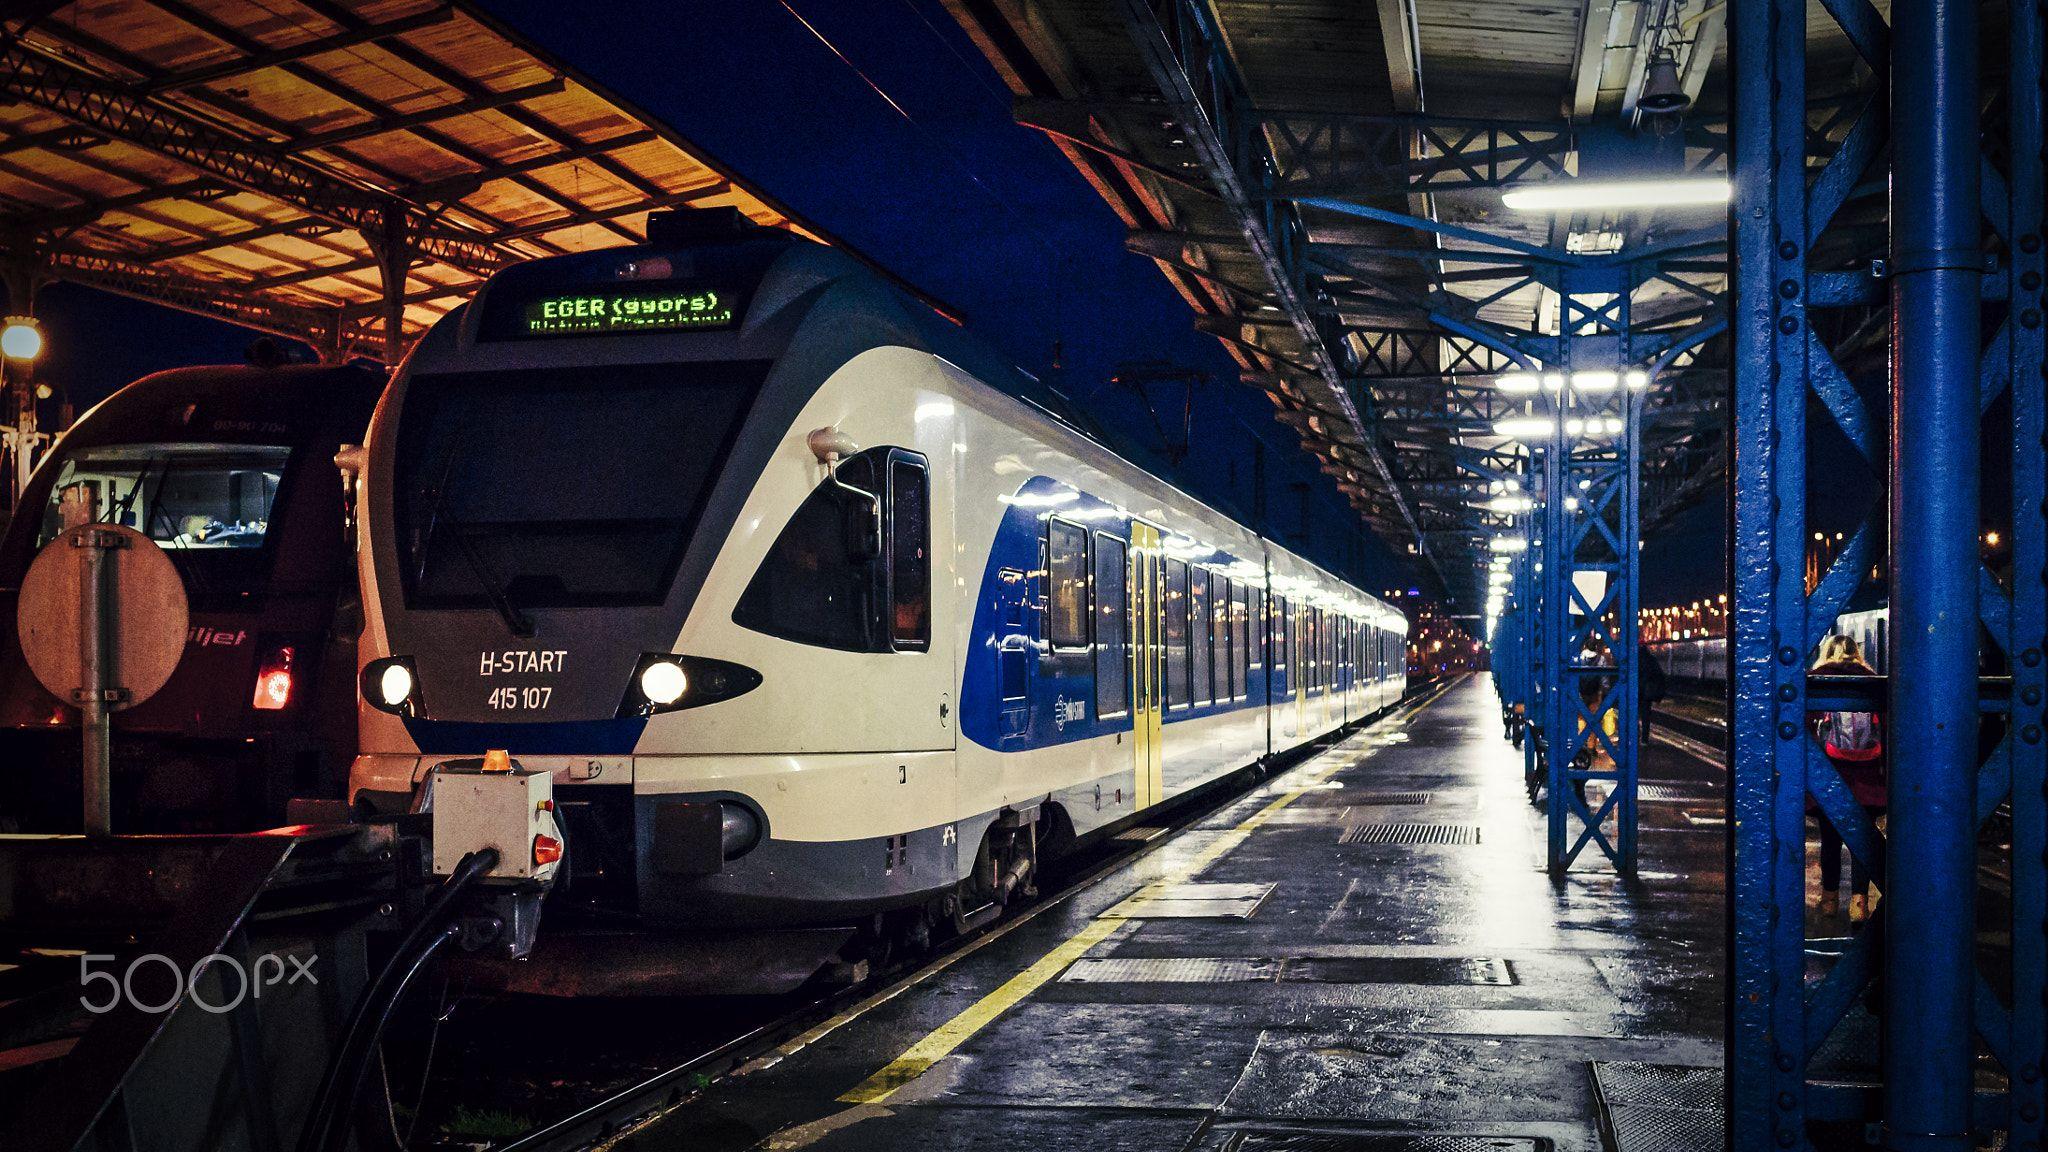 Train - Railway station, locomotive, Budapest